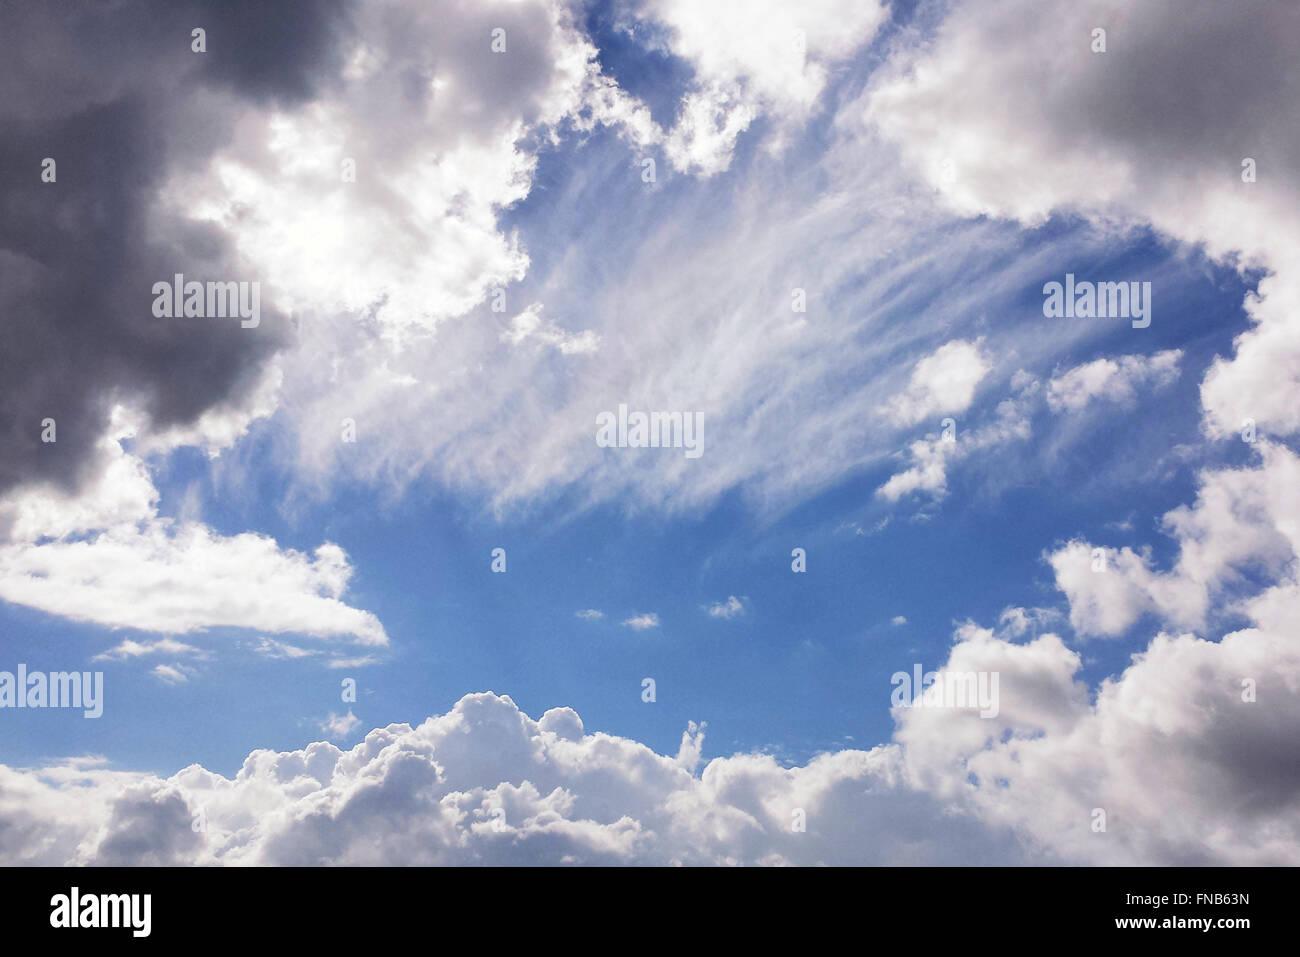 Fond bleu ciel nuage Photo Stock